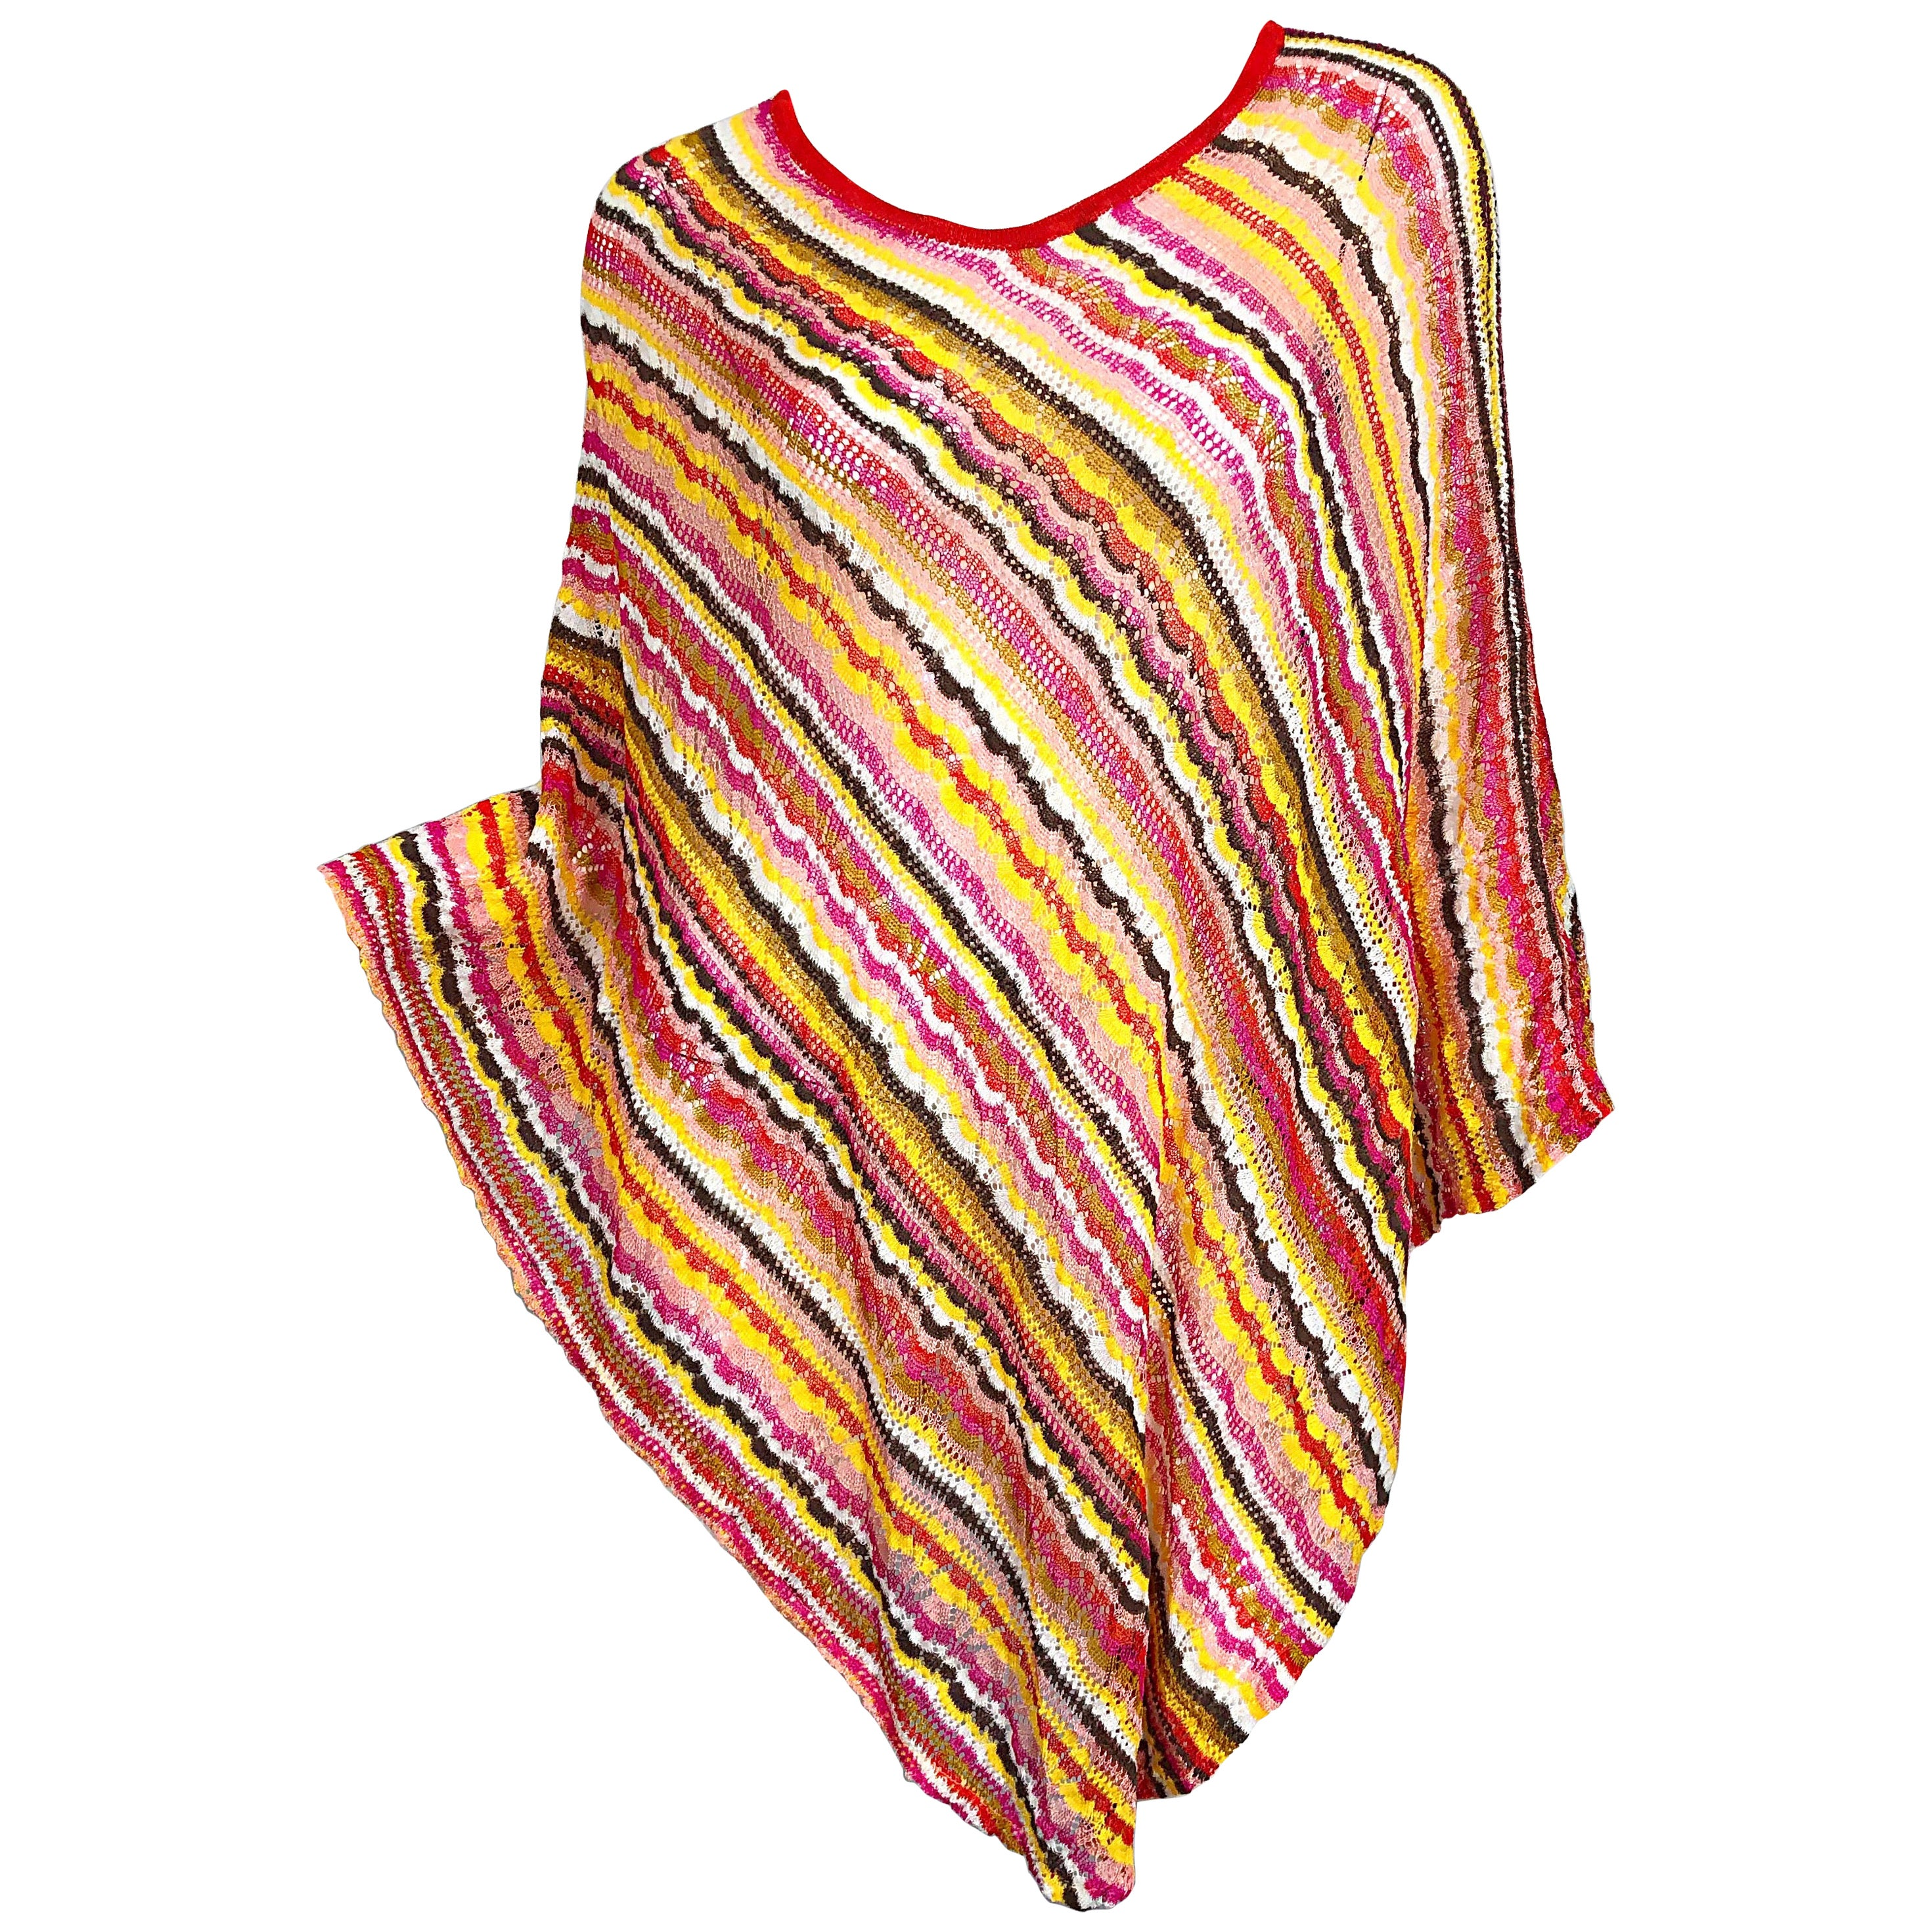 1970s Missoni Multi Colored Pink Yellow Orange Crochet Vintage 70s Poncho Top